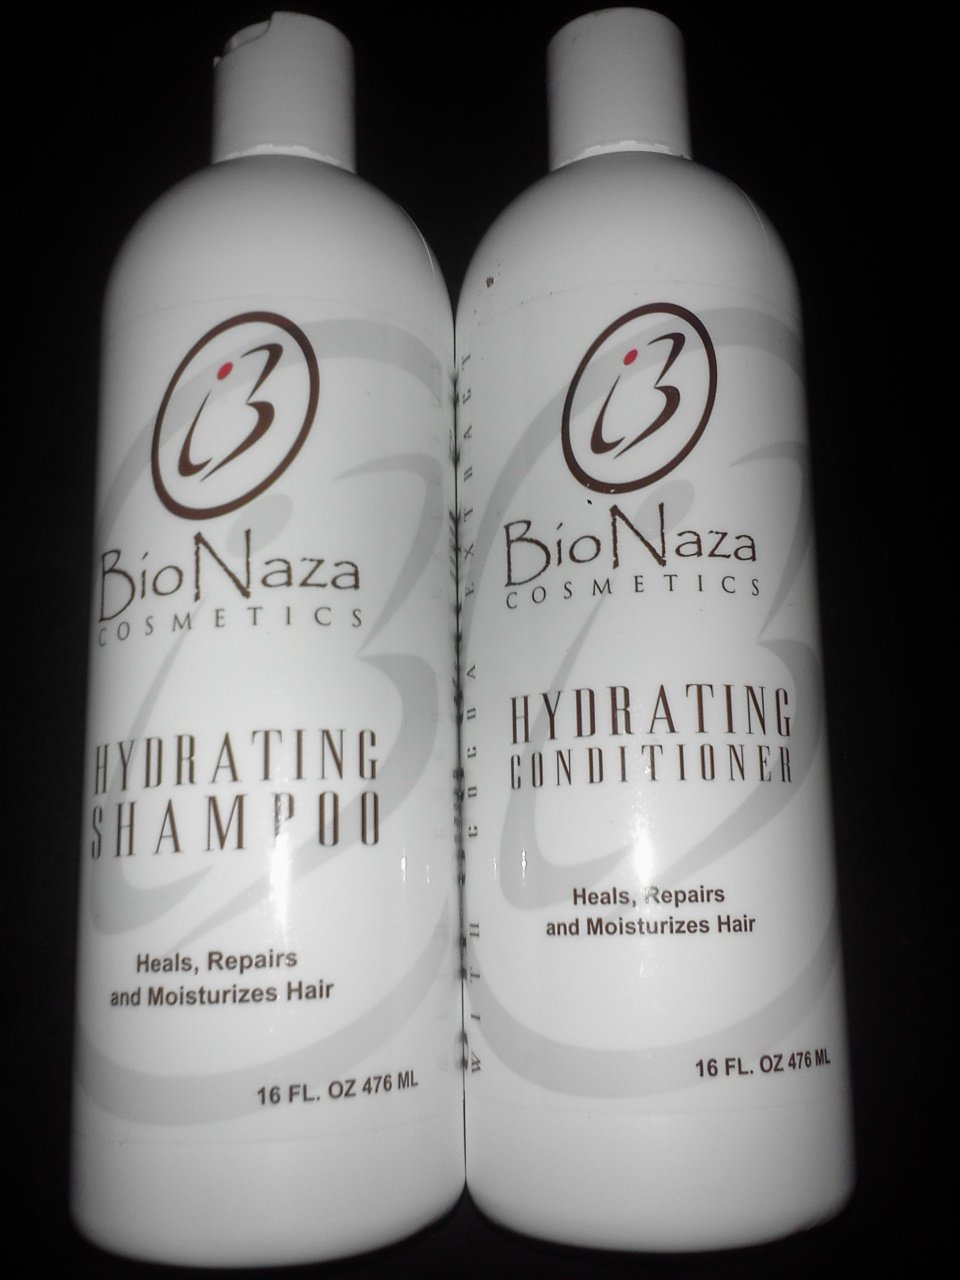 BioNaza ChocoHair Hydrating Shampoo + Conditioner 16 Oz by BioNaza